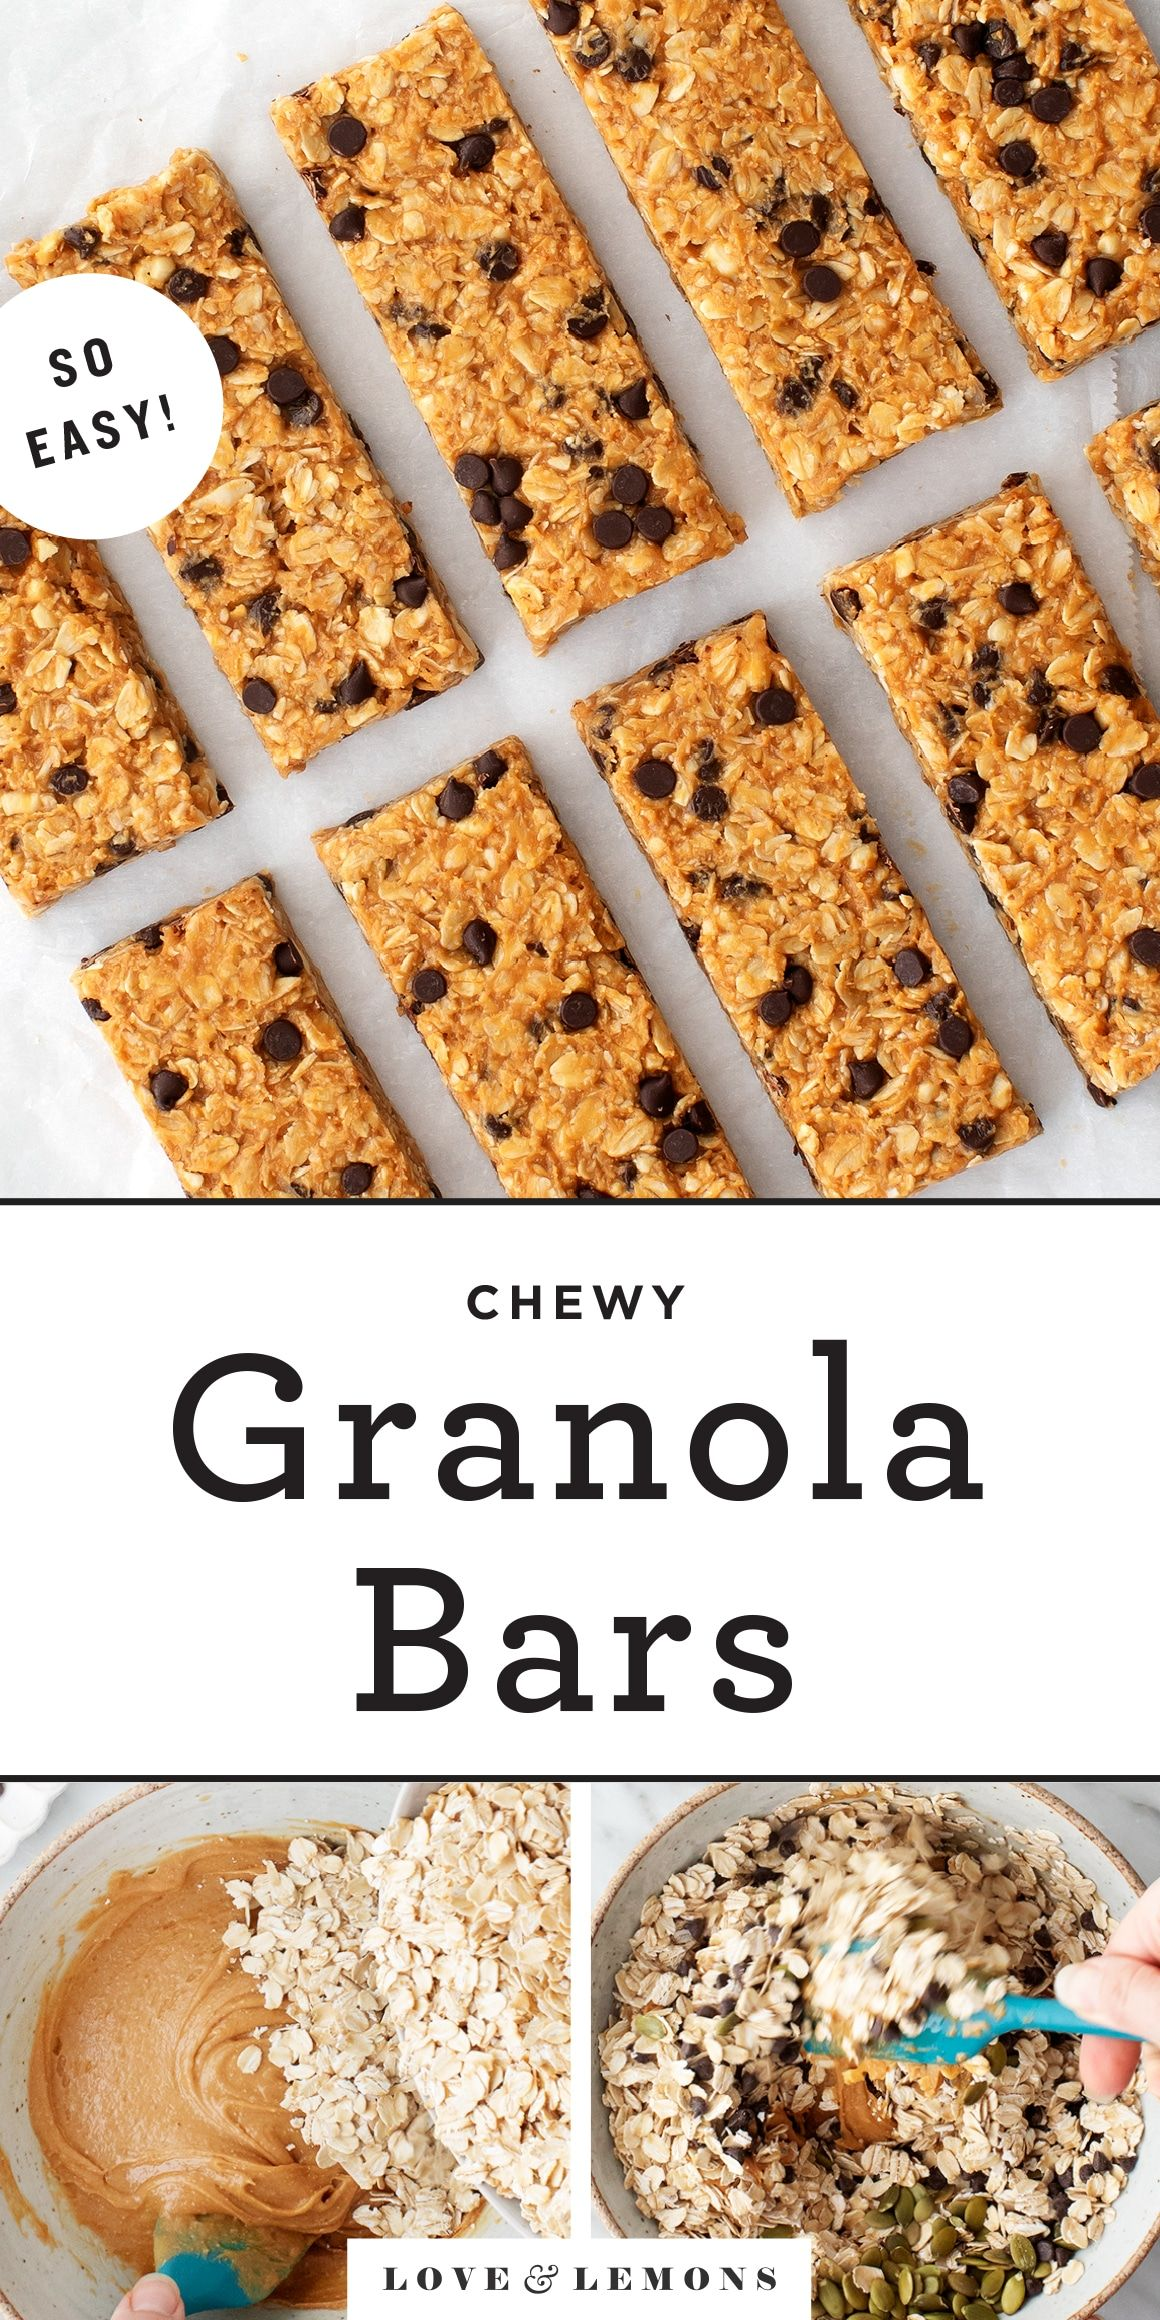 Homemade Granola Bars Recipe Love And Lemons Recipe In 2020 Homemade Granola Bar Recipe Chewy Granola Bars Granola Recipe Bars